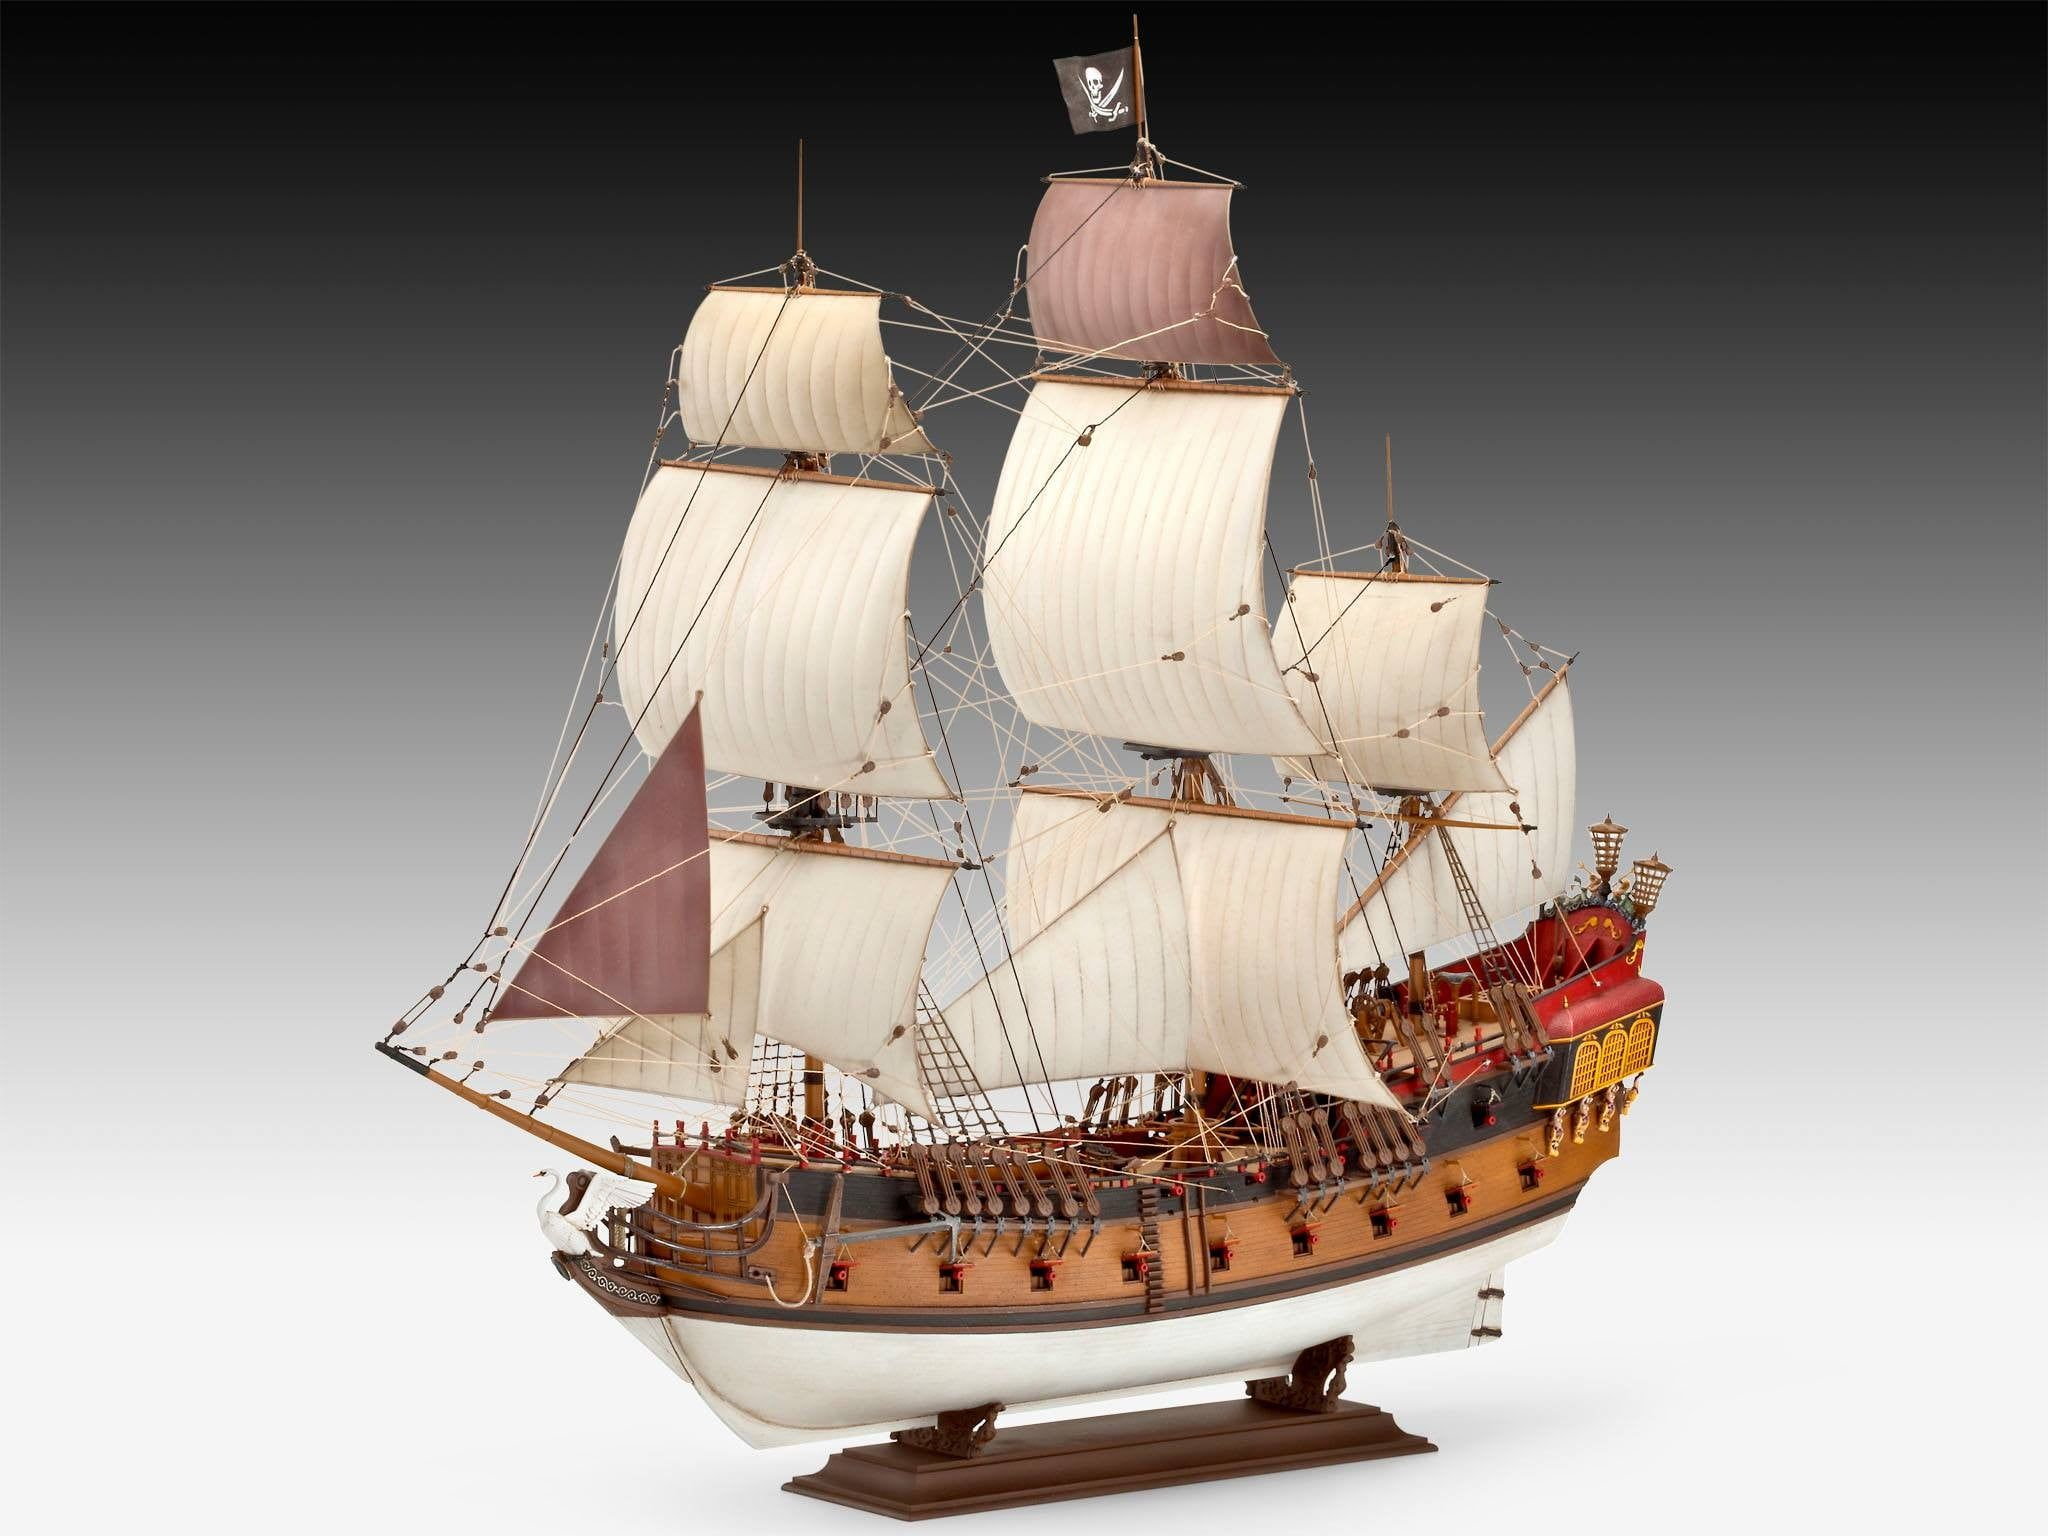 Revell Pirate Ship 1:72 Scale Detailed Plastic Model Kit